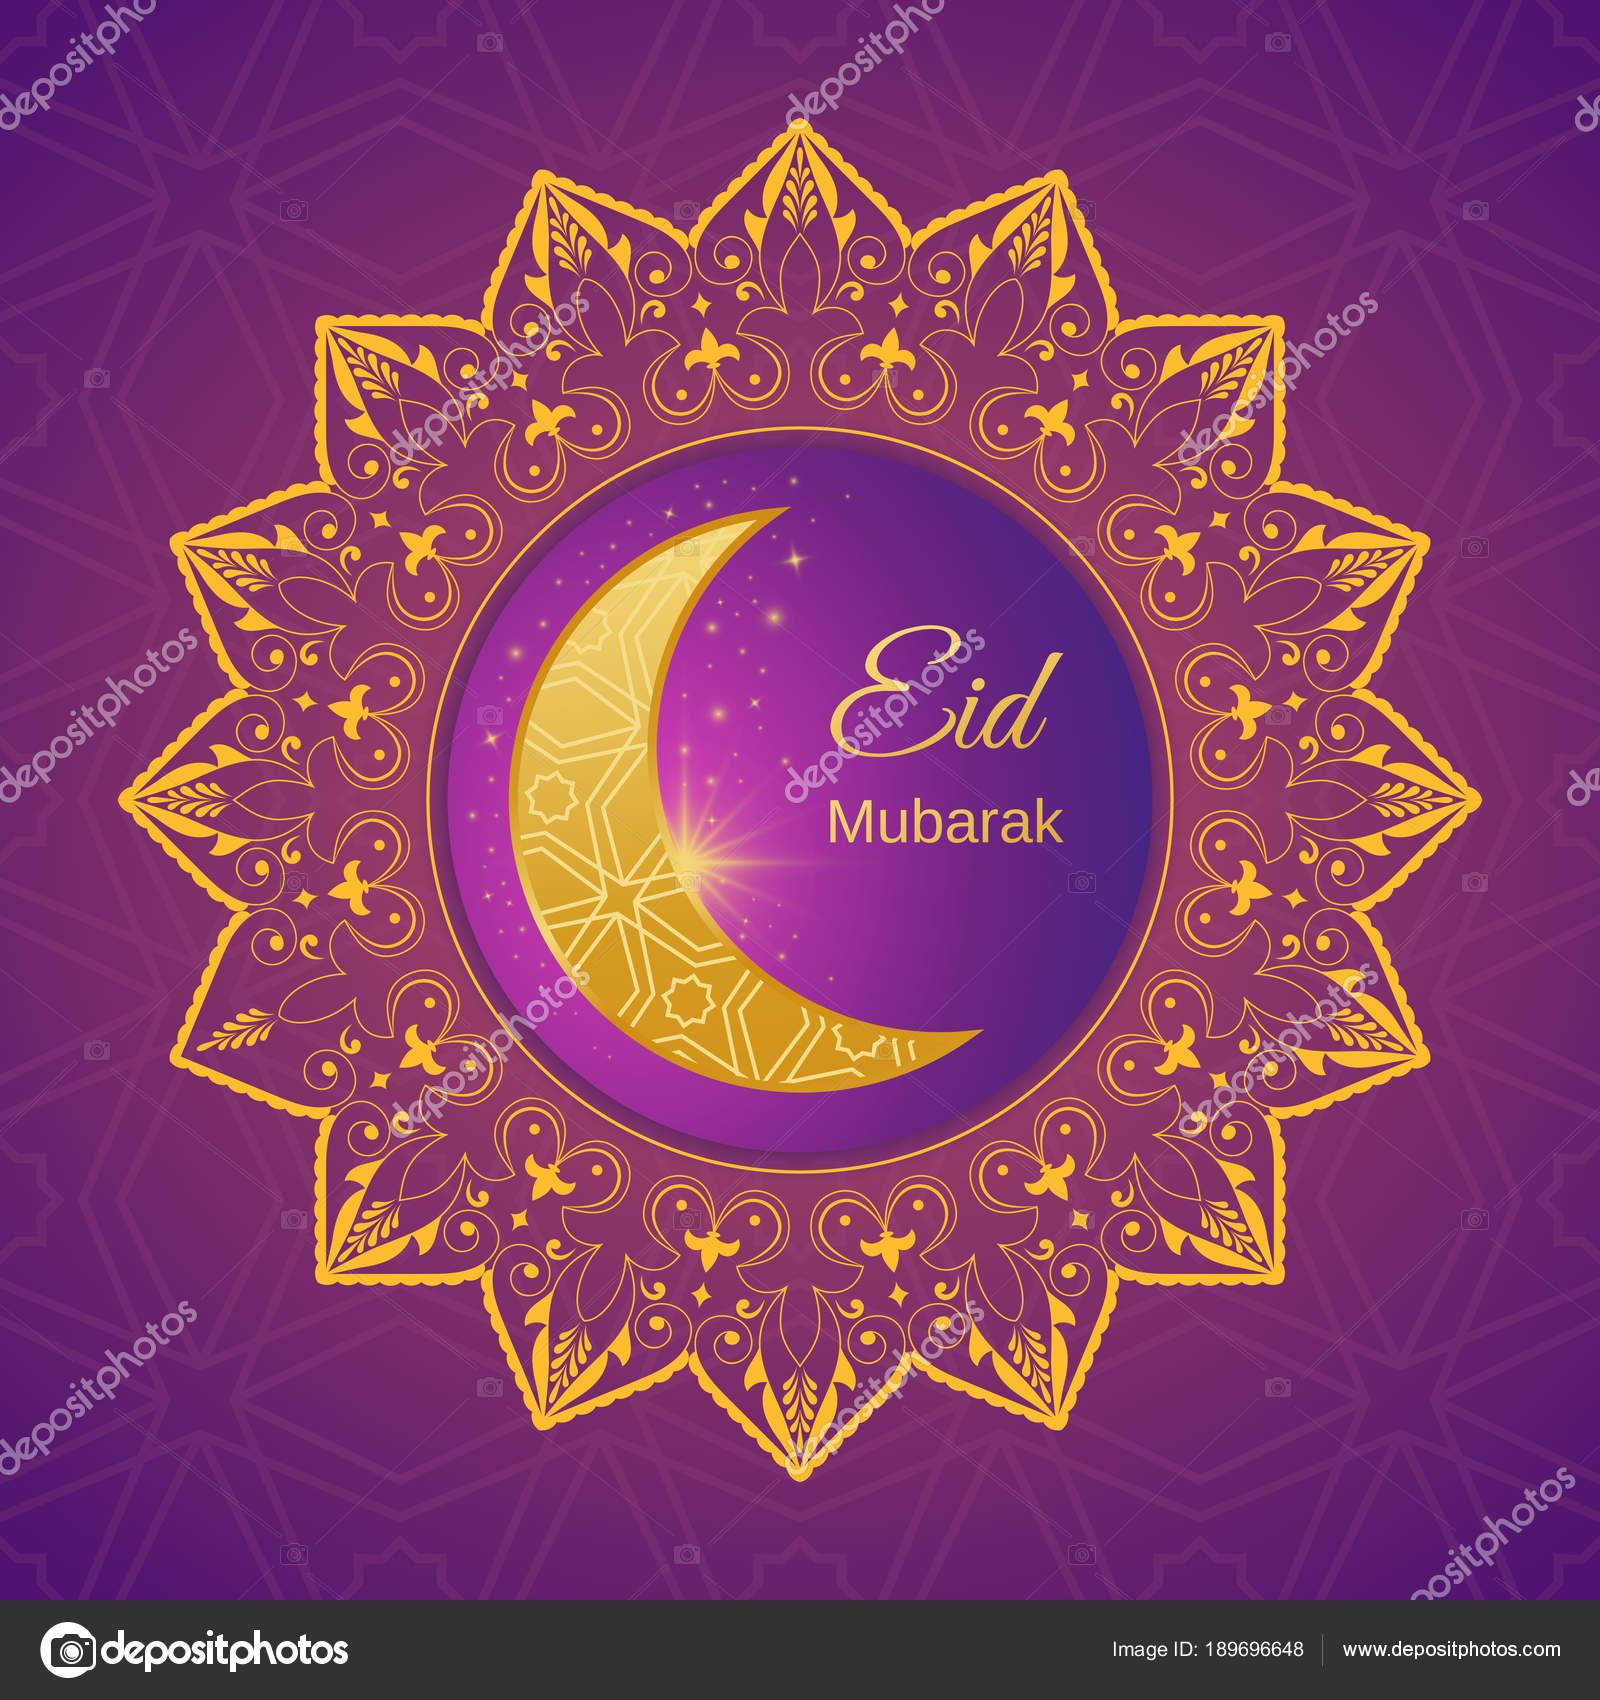 Greeting card eid mubarak with islamic geometric patterns and a greeting card eid mubarak with islamic geometric patterns and a stock vector m4hsunfo